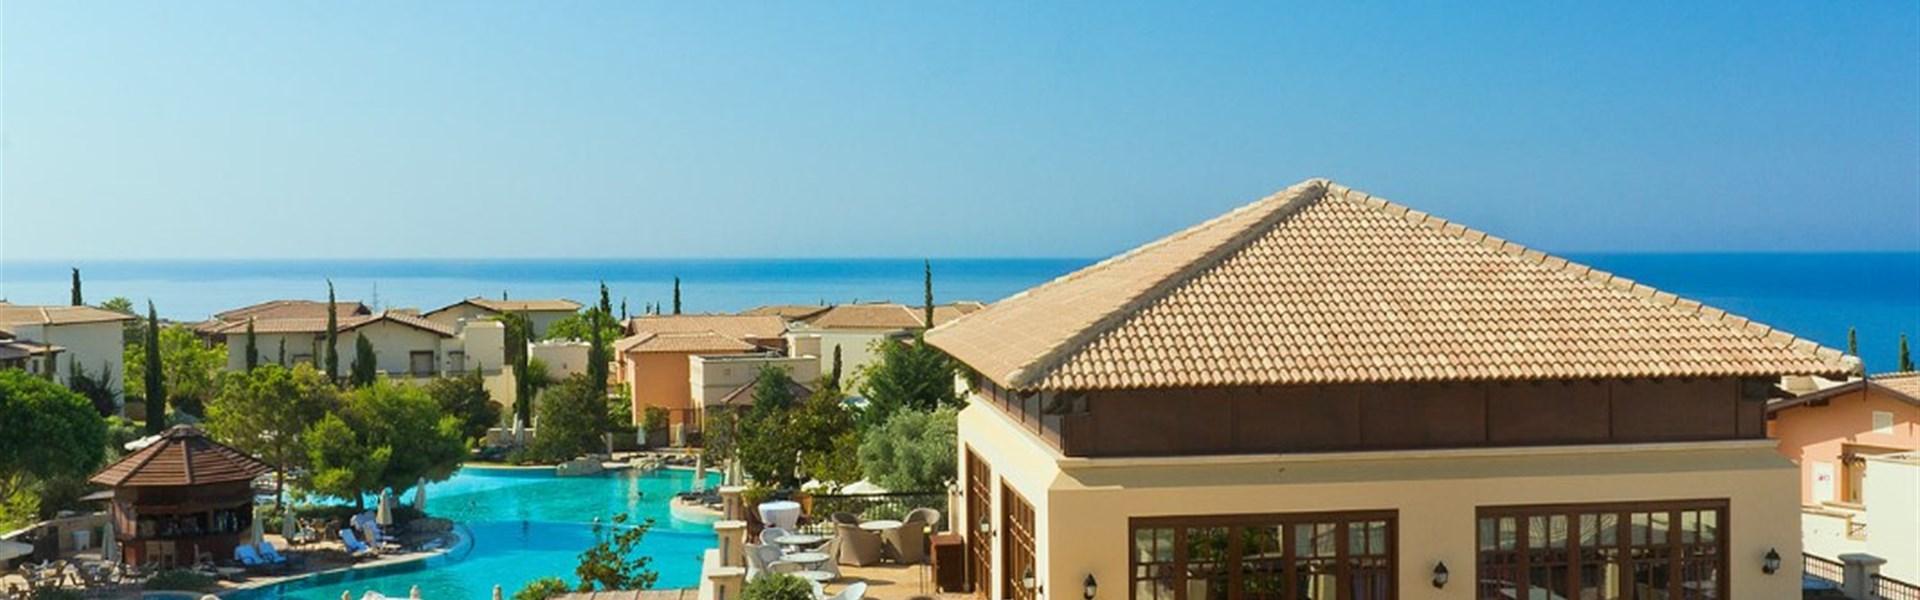 Marco Polo - Aphrodite Hills Resort -